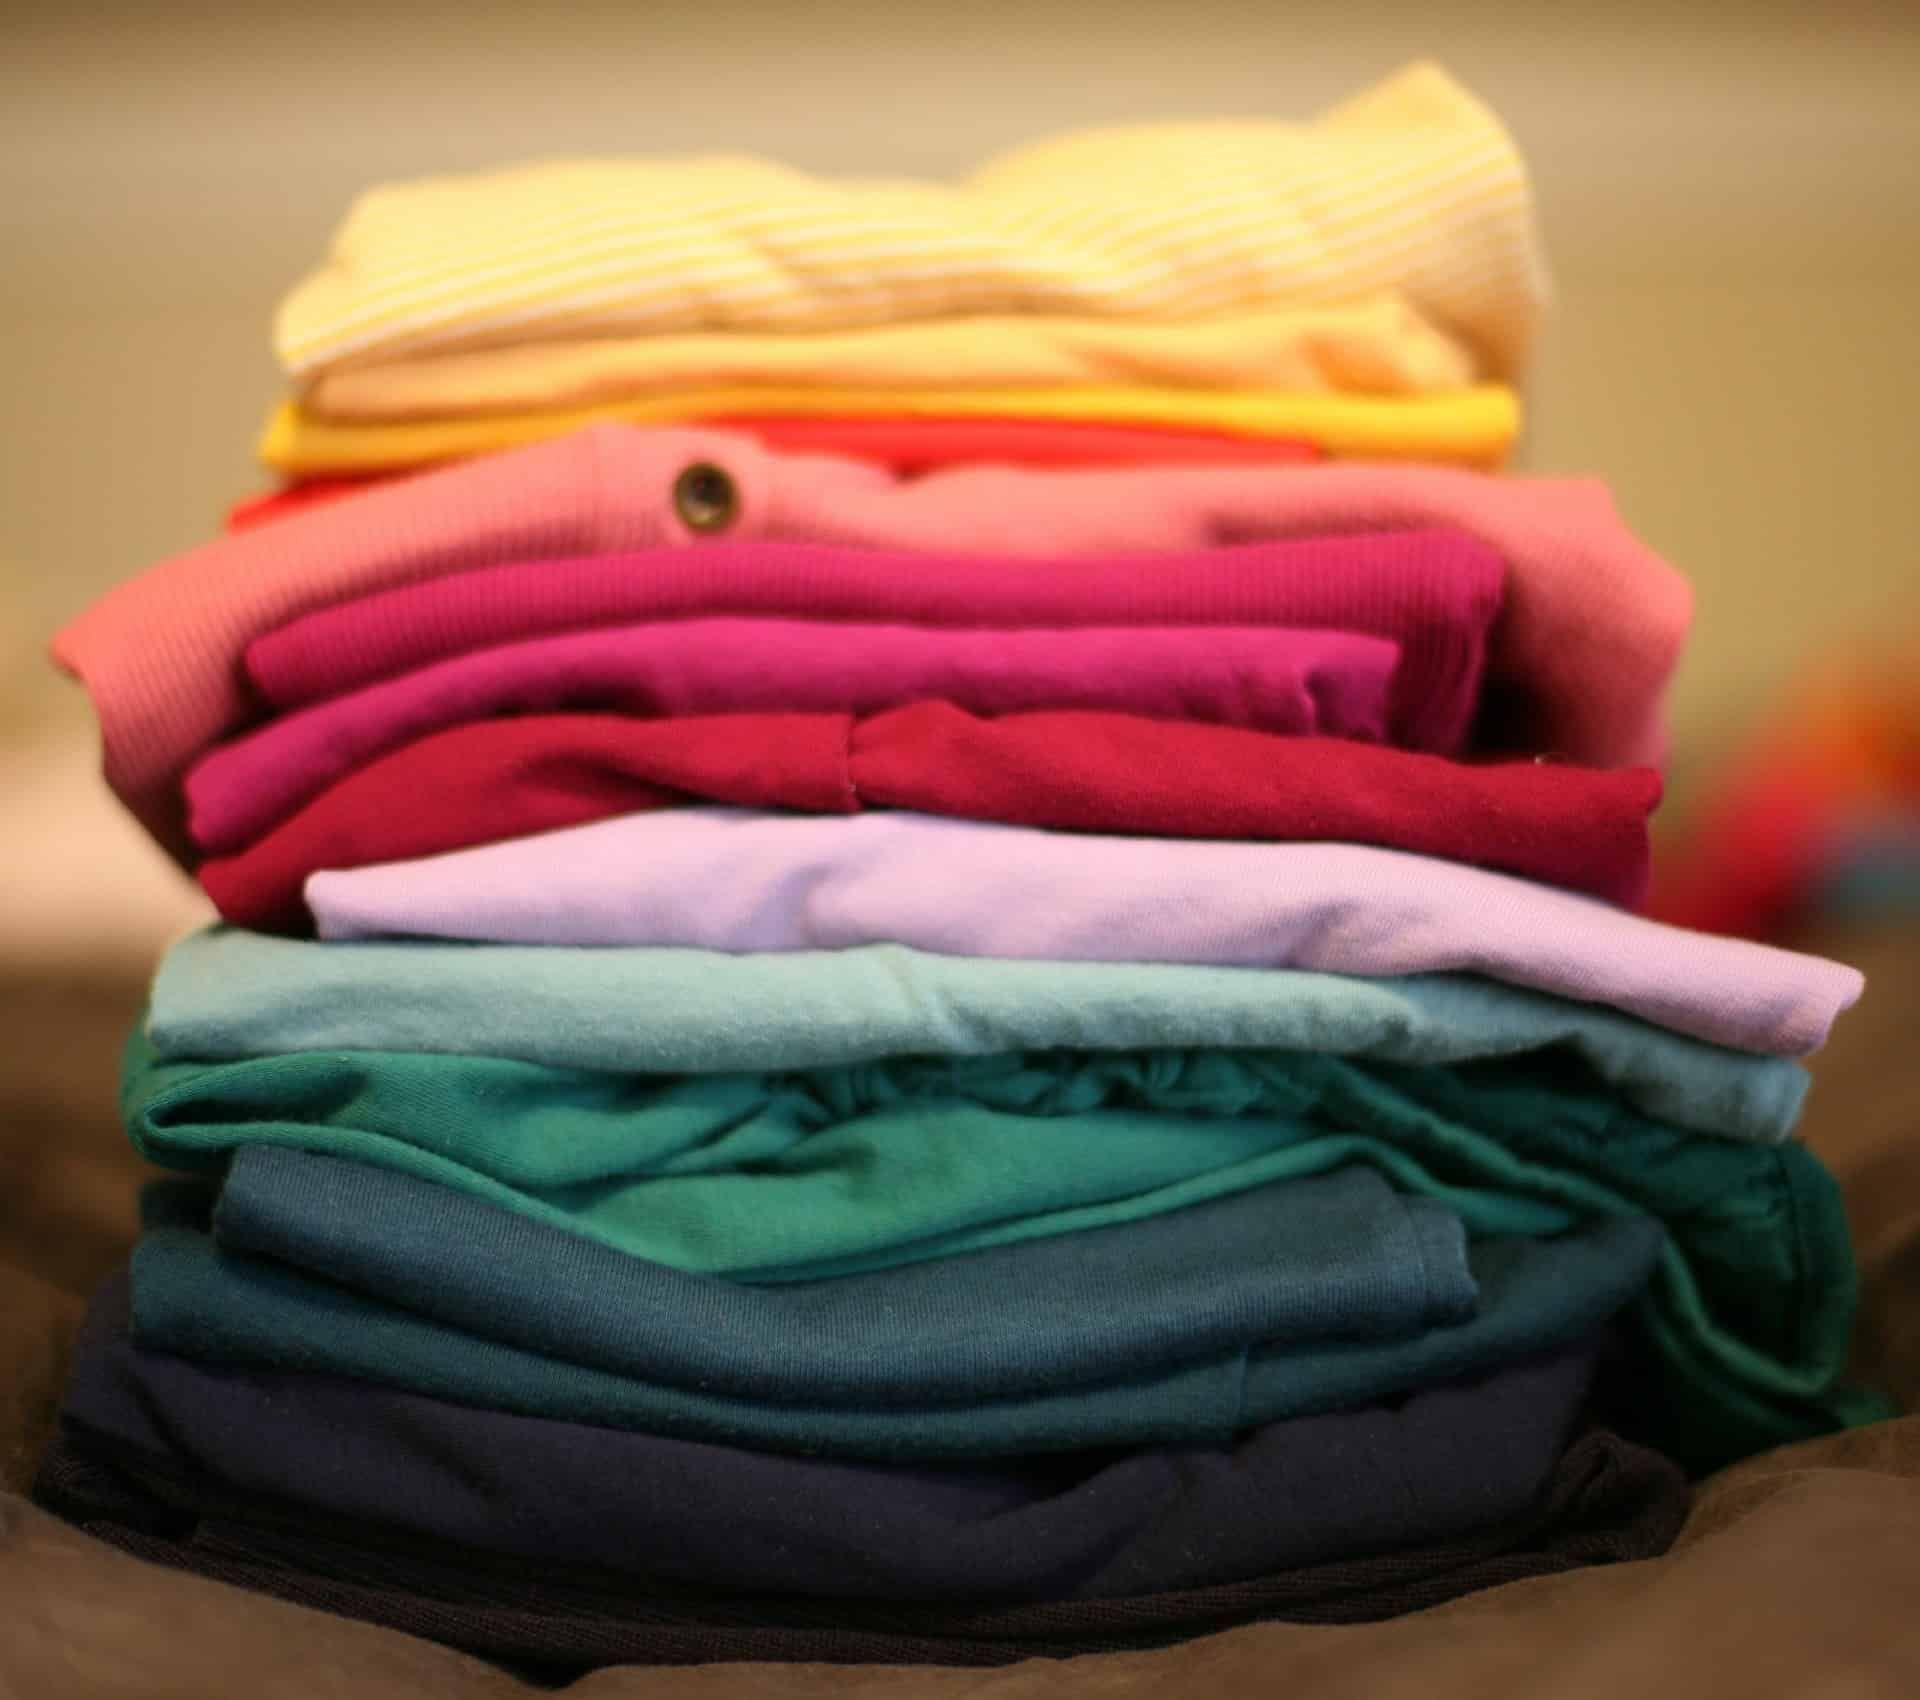 A Catholic Alternative to Konmari Folding clothes